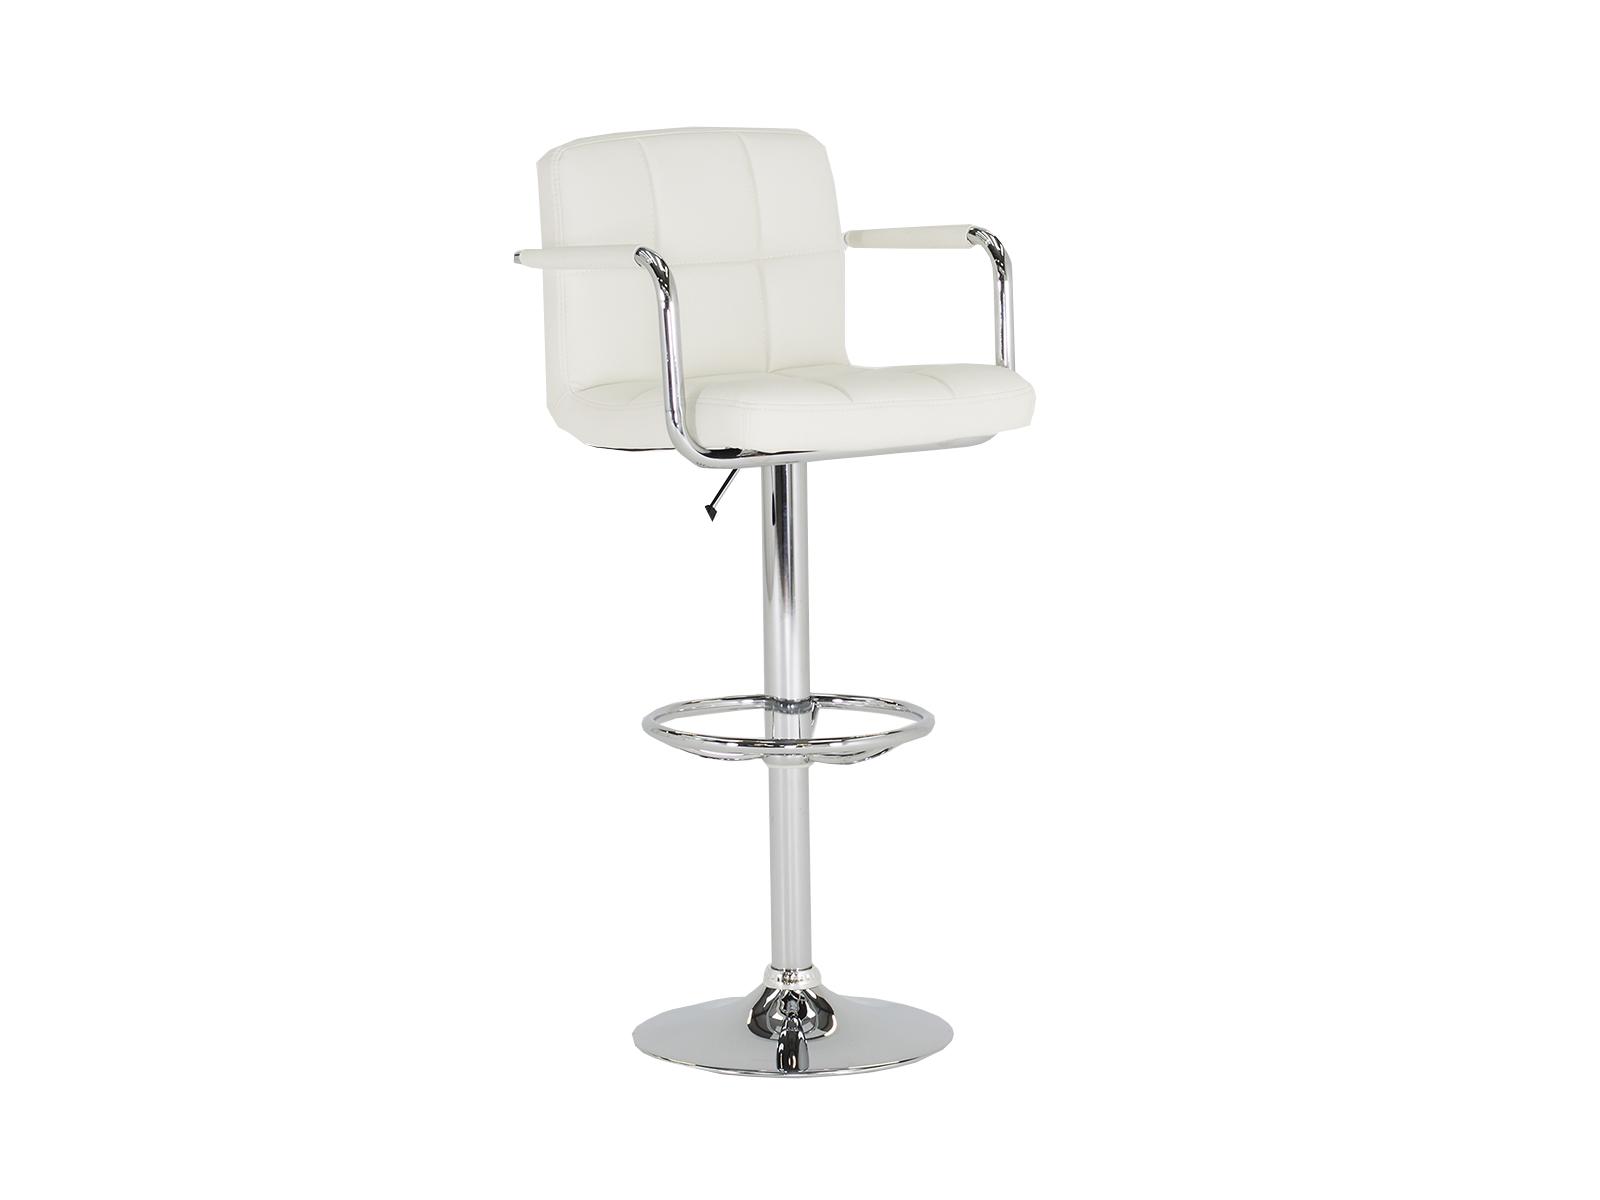 Scaun de bar tapitat cu piele ecologica cu picior metalic Miami White l45xA45xH101 cm